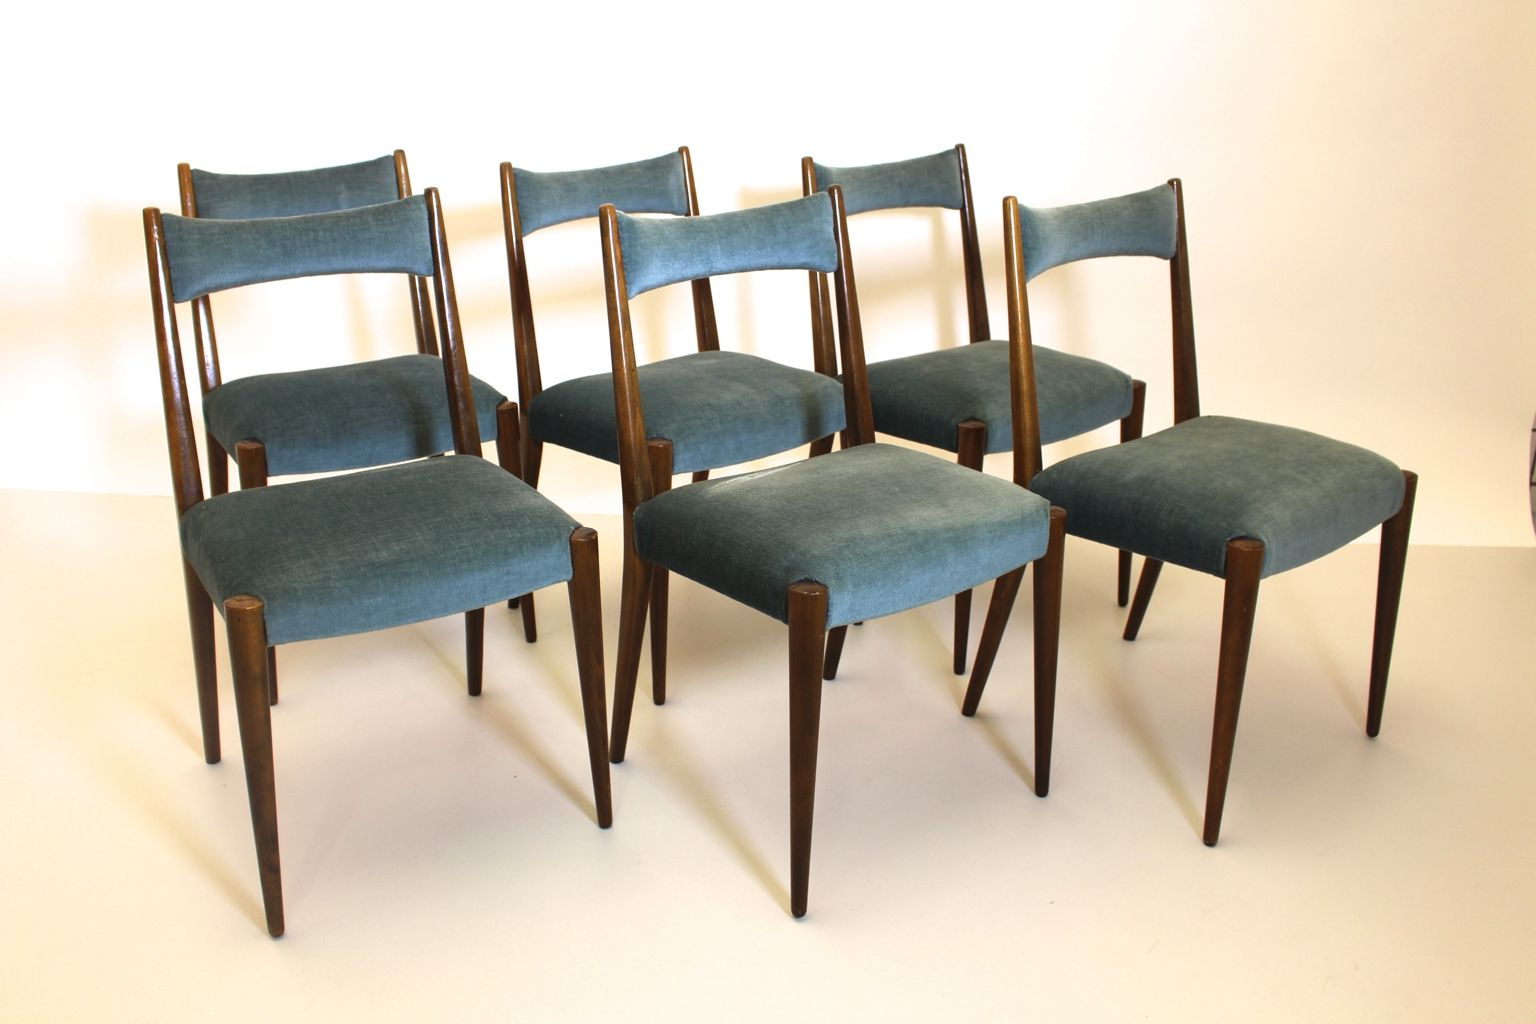 Viennese Dining Chairs by Anna Lülja Praun for Wiesner